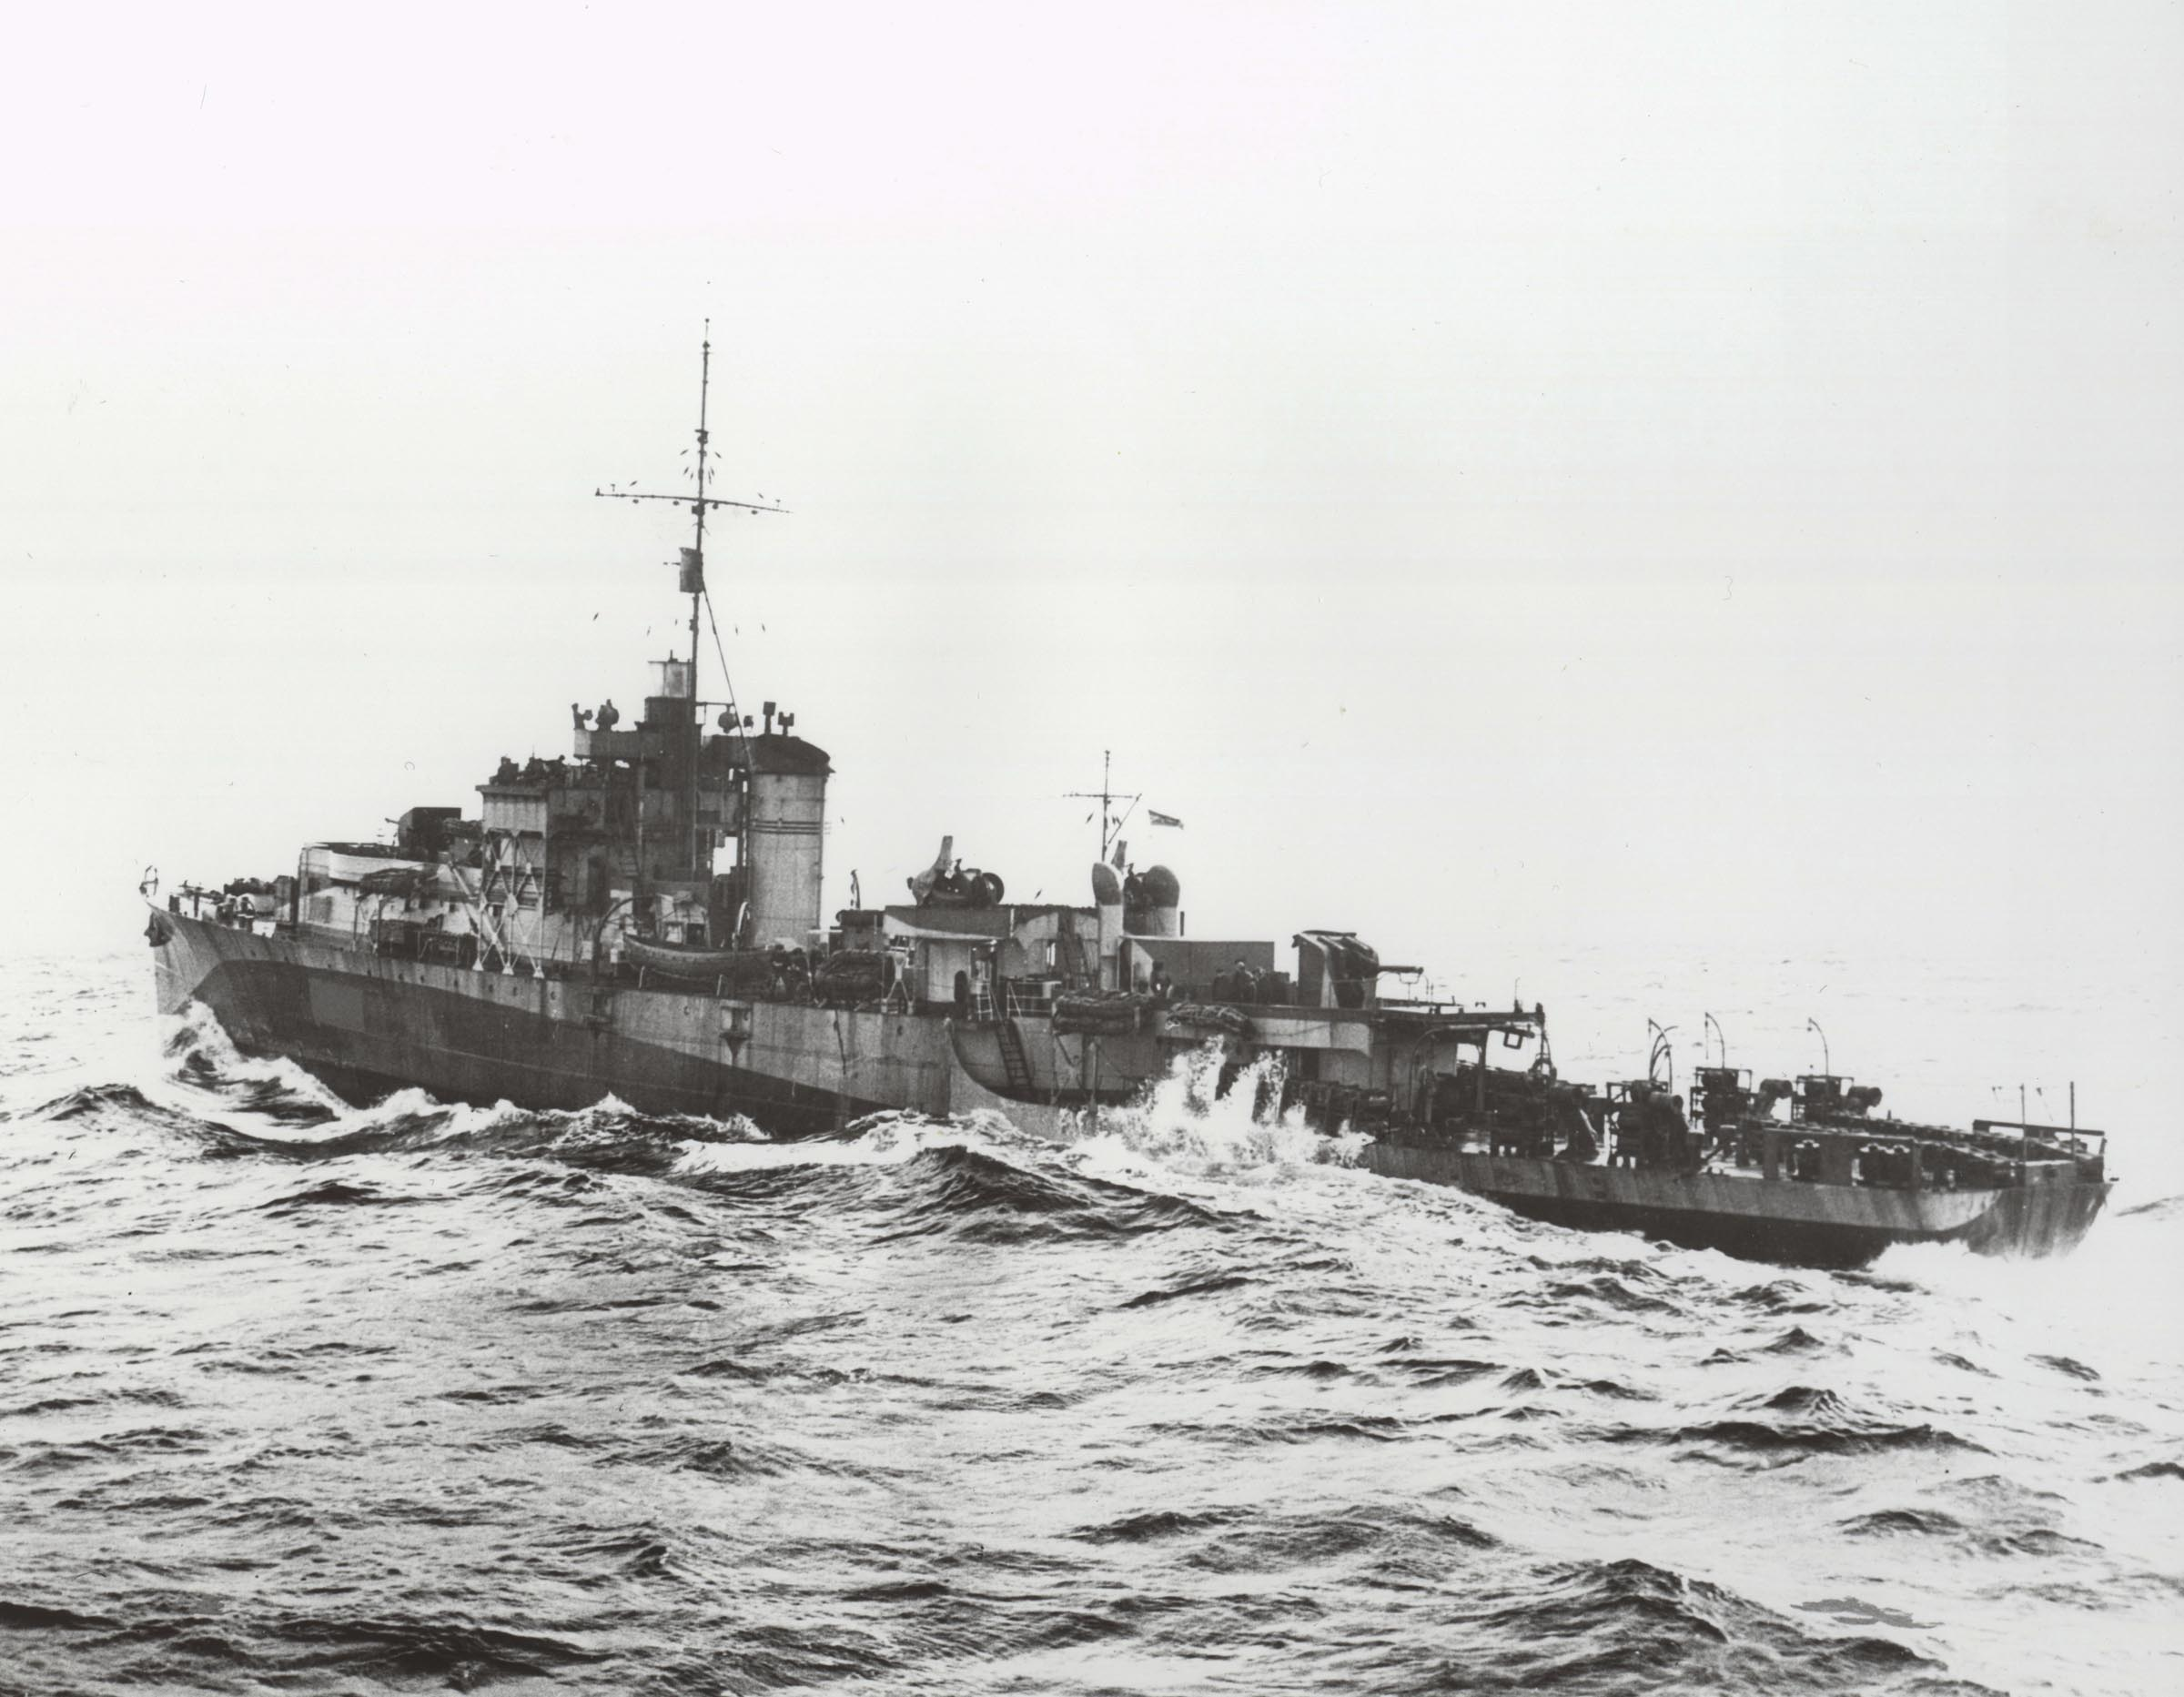 HMCS ETTRICK